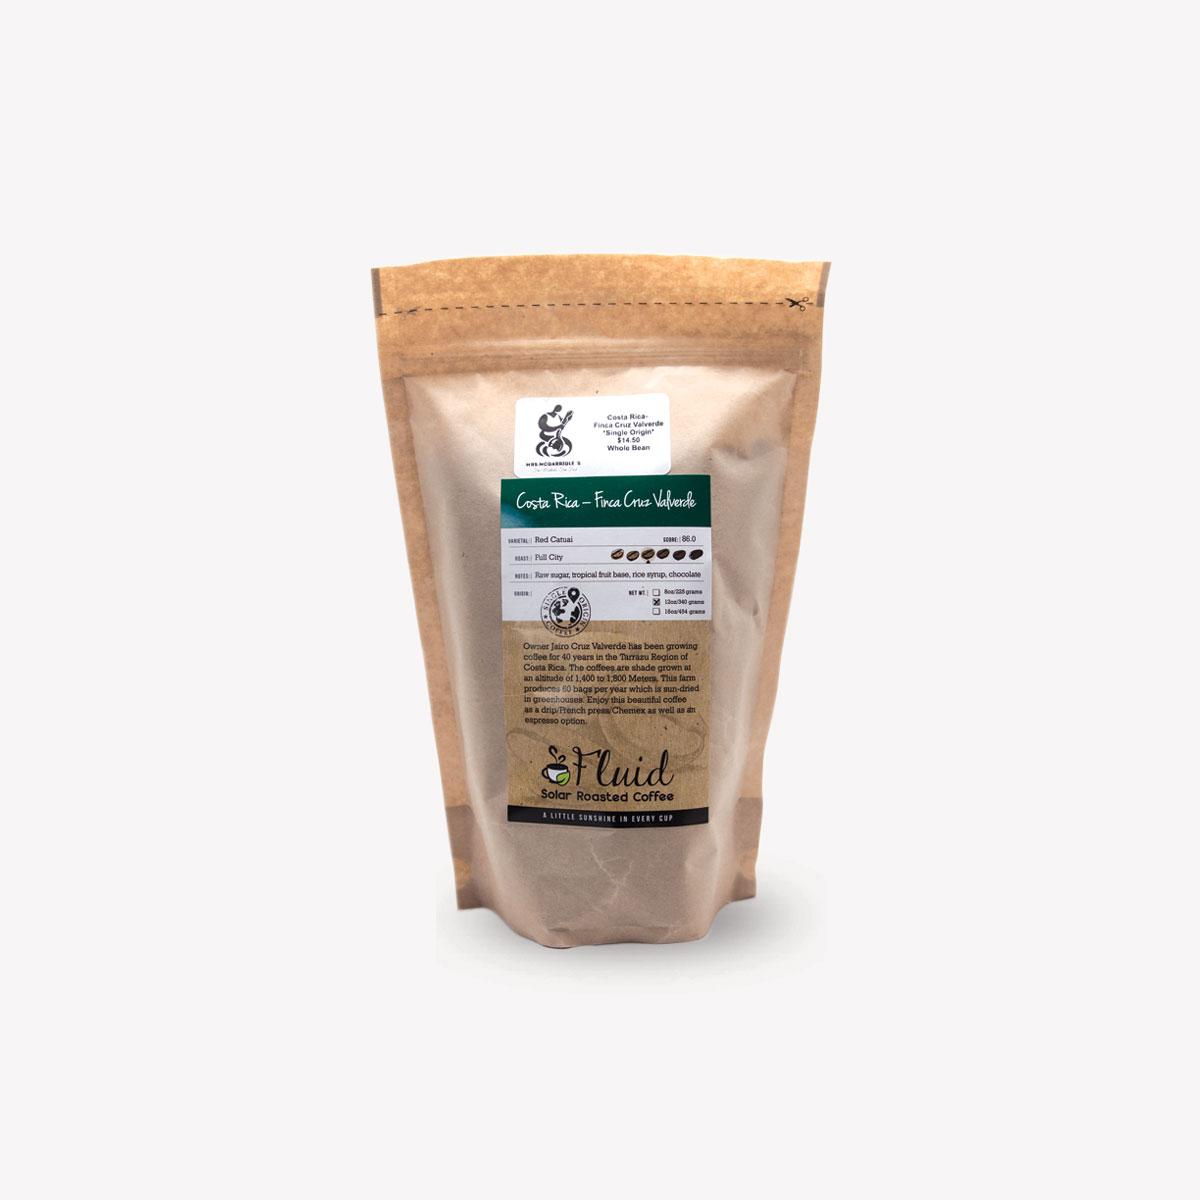 Fluid Solar Roasted Coffee Ambrosia Coffee